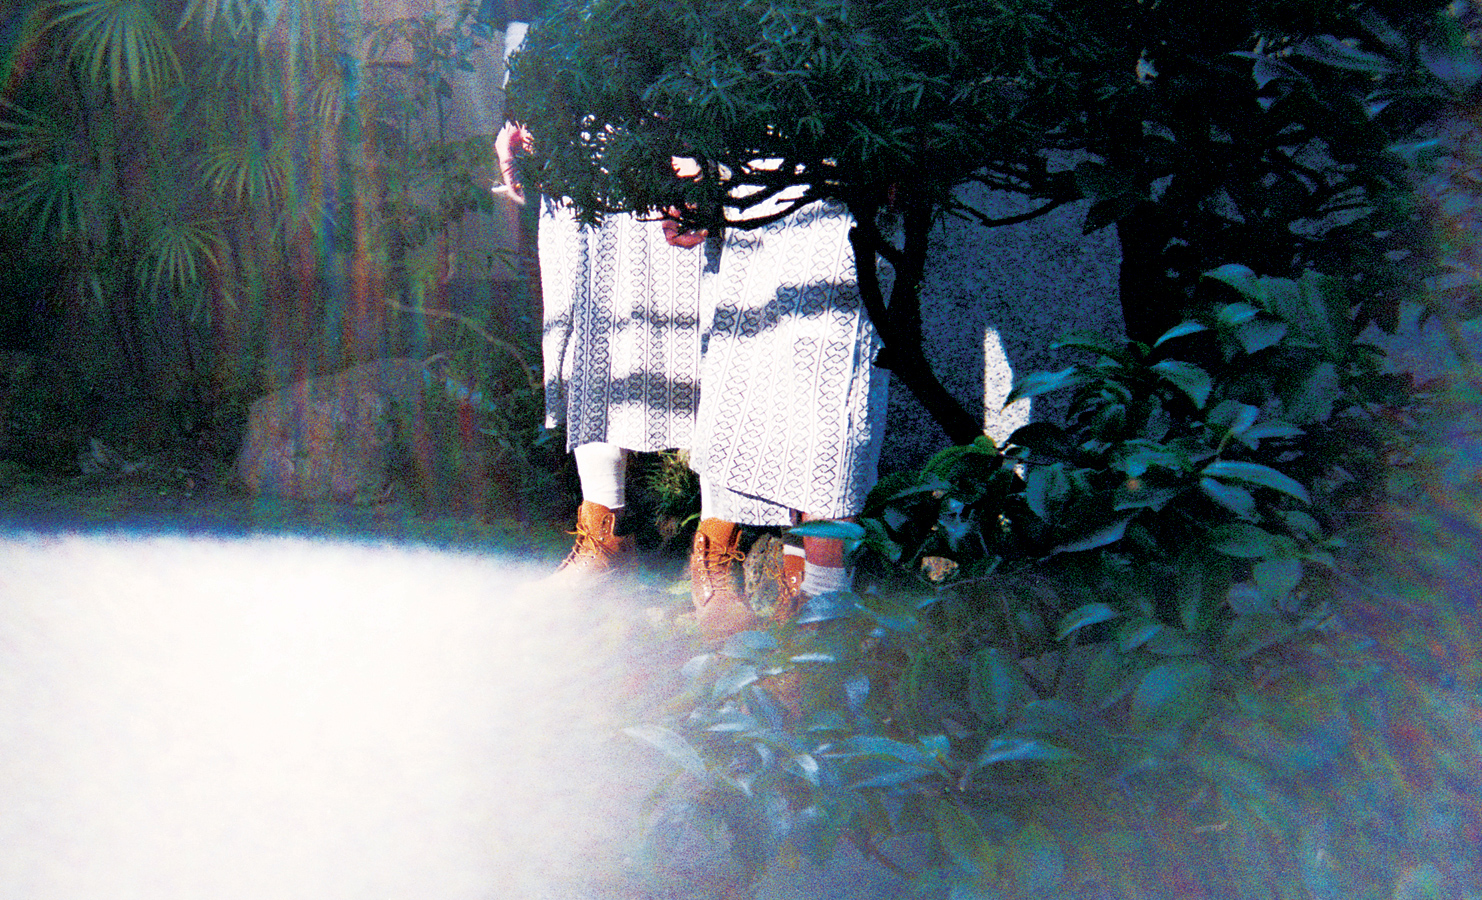 Timberlandの6INCH PREMIUM BOOTS 22,000円 + 税